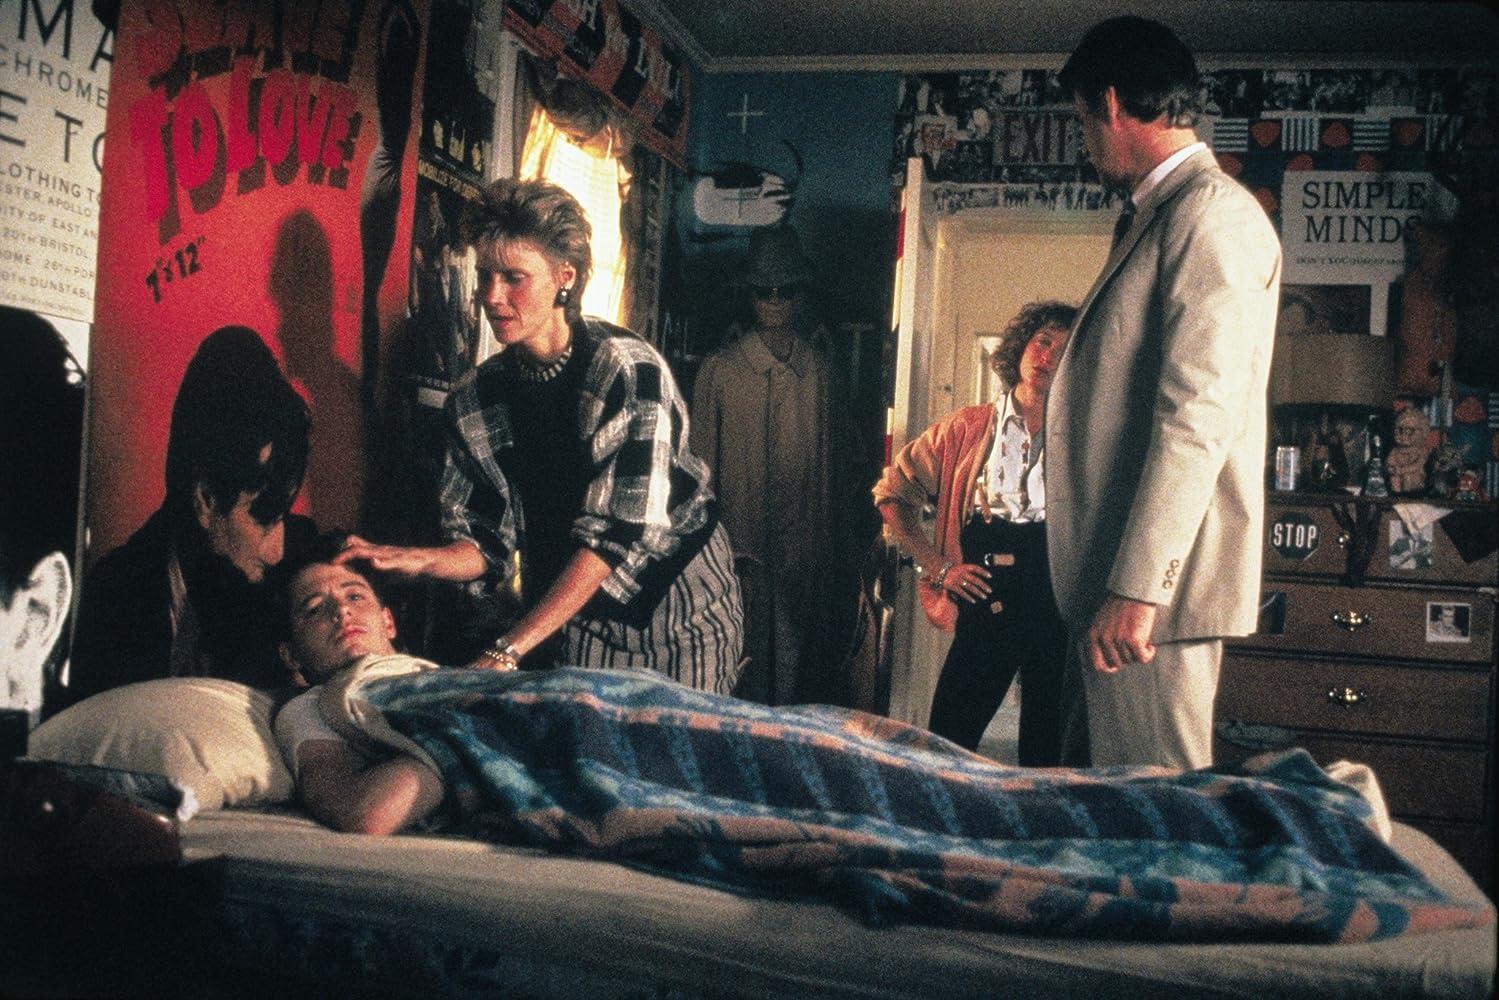 Matthew Broderick, Jennifer Grey, Cindy Pickett, and Lyman Ward in Ferris Bueller's Day Off (1986)